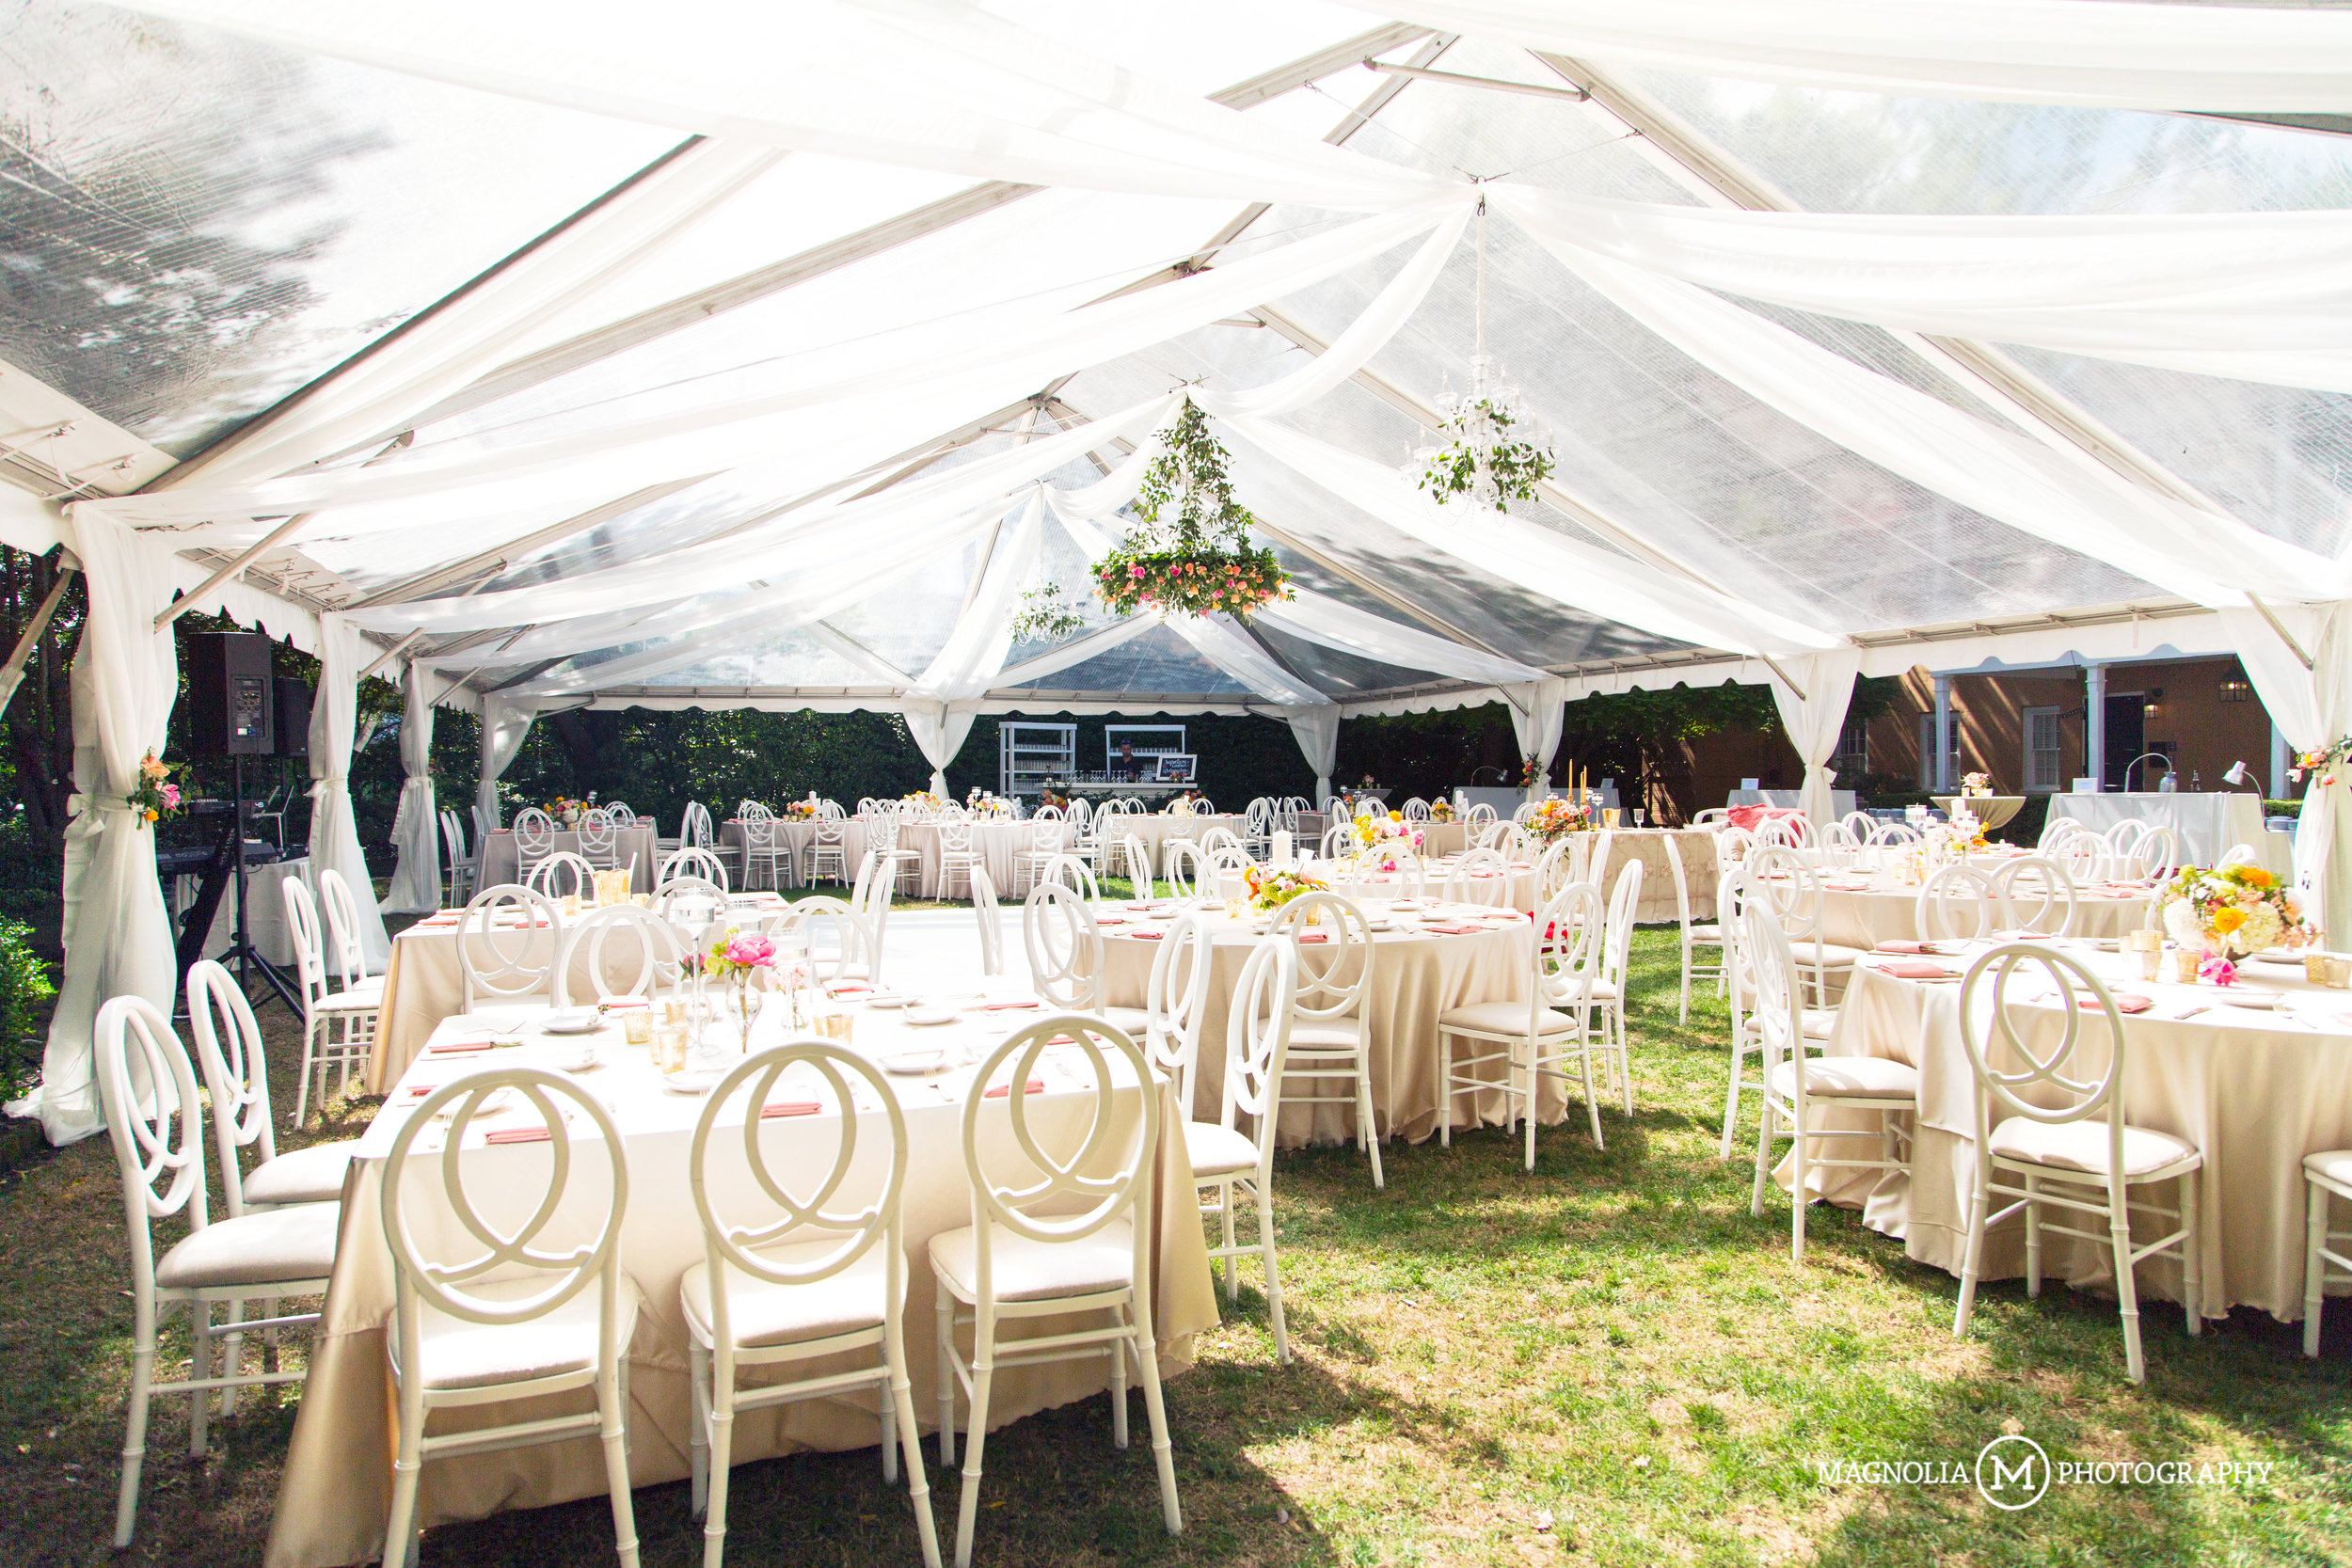 weddings at thomas bennett house-057.jpg